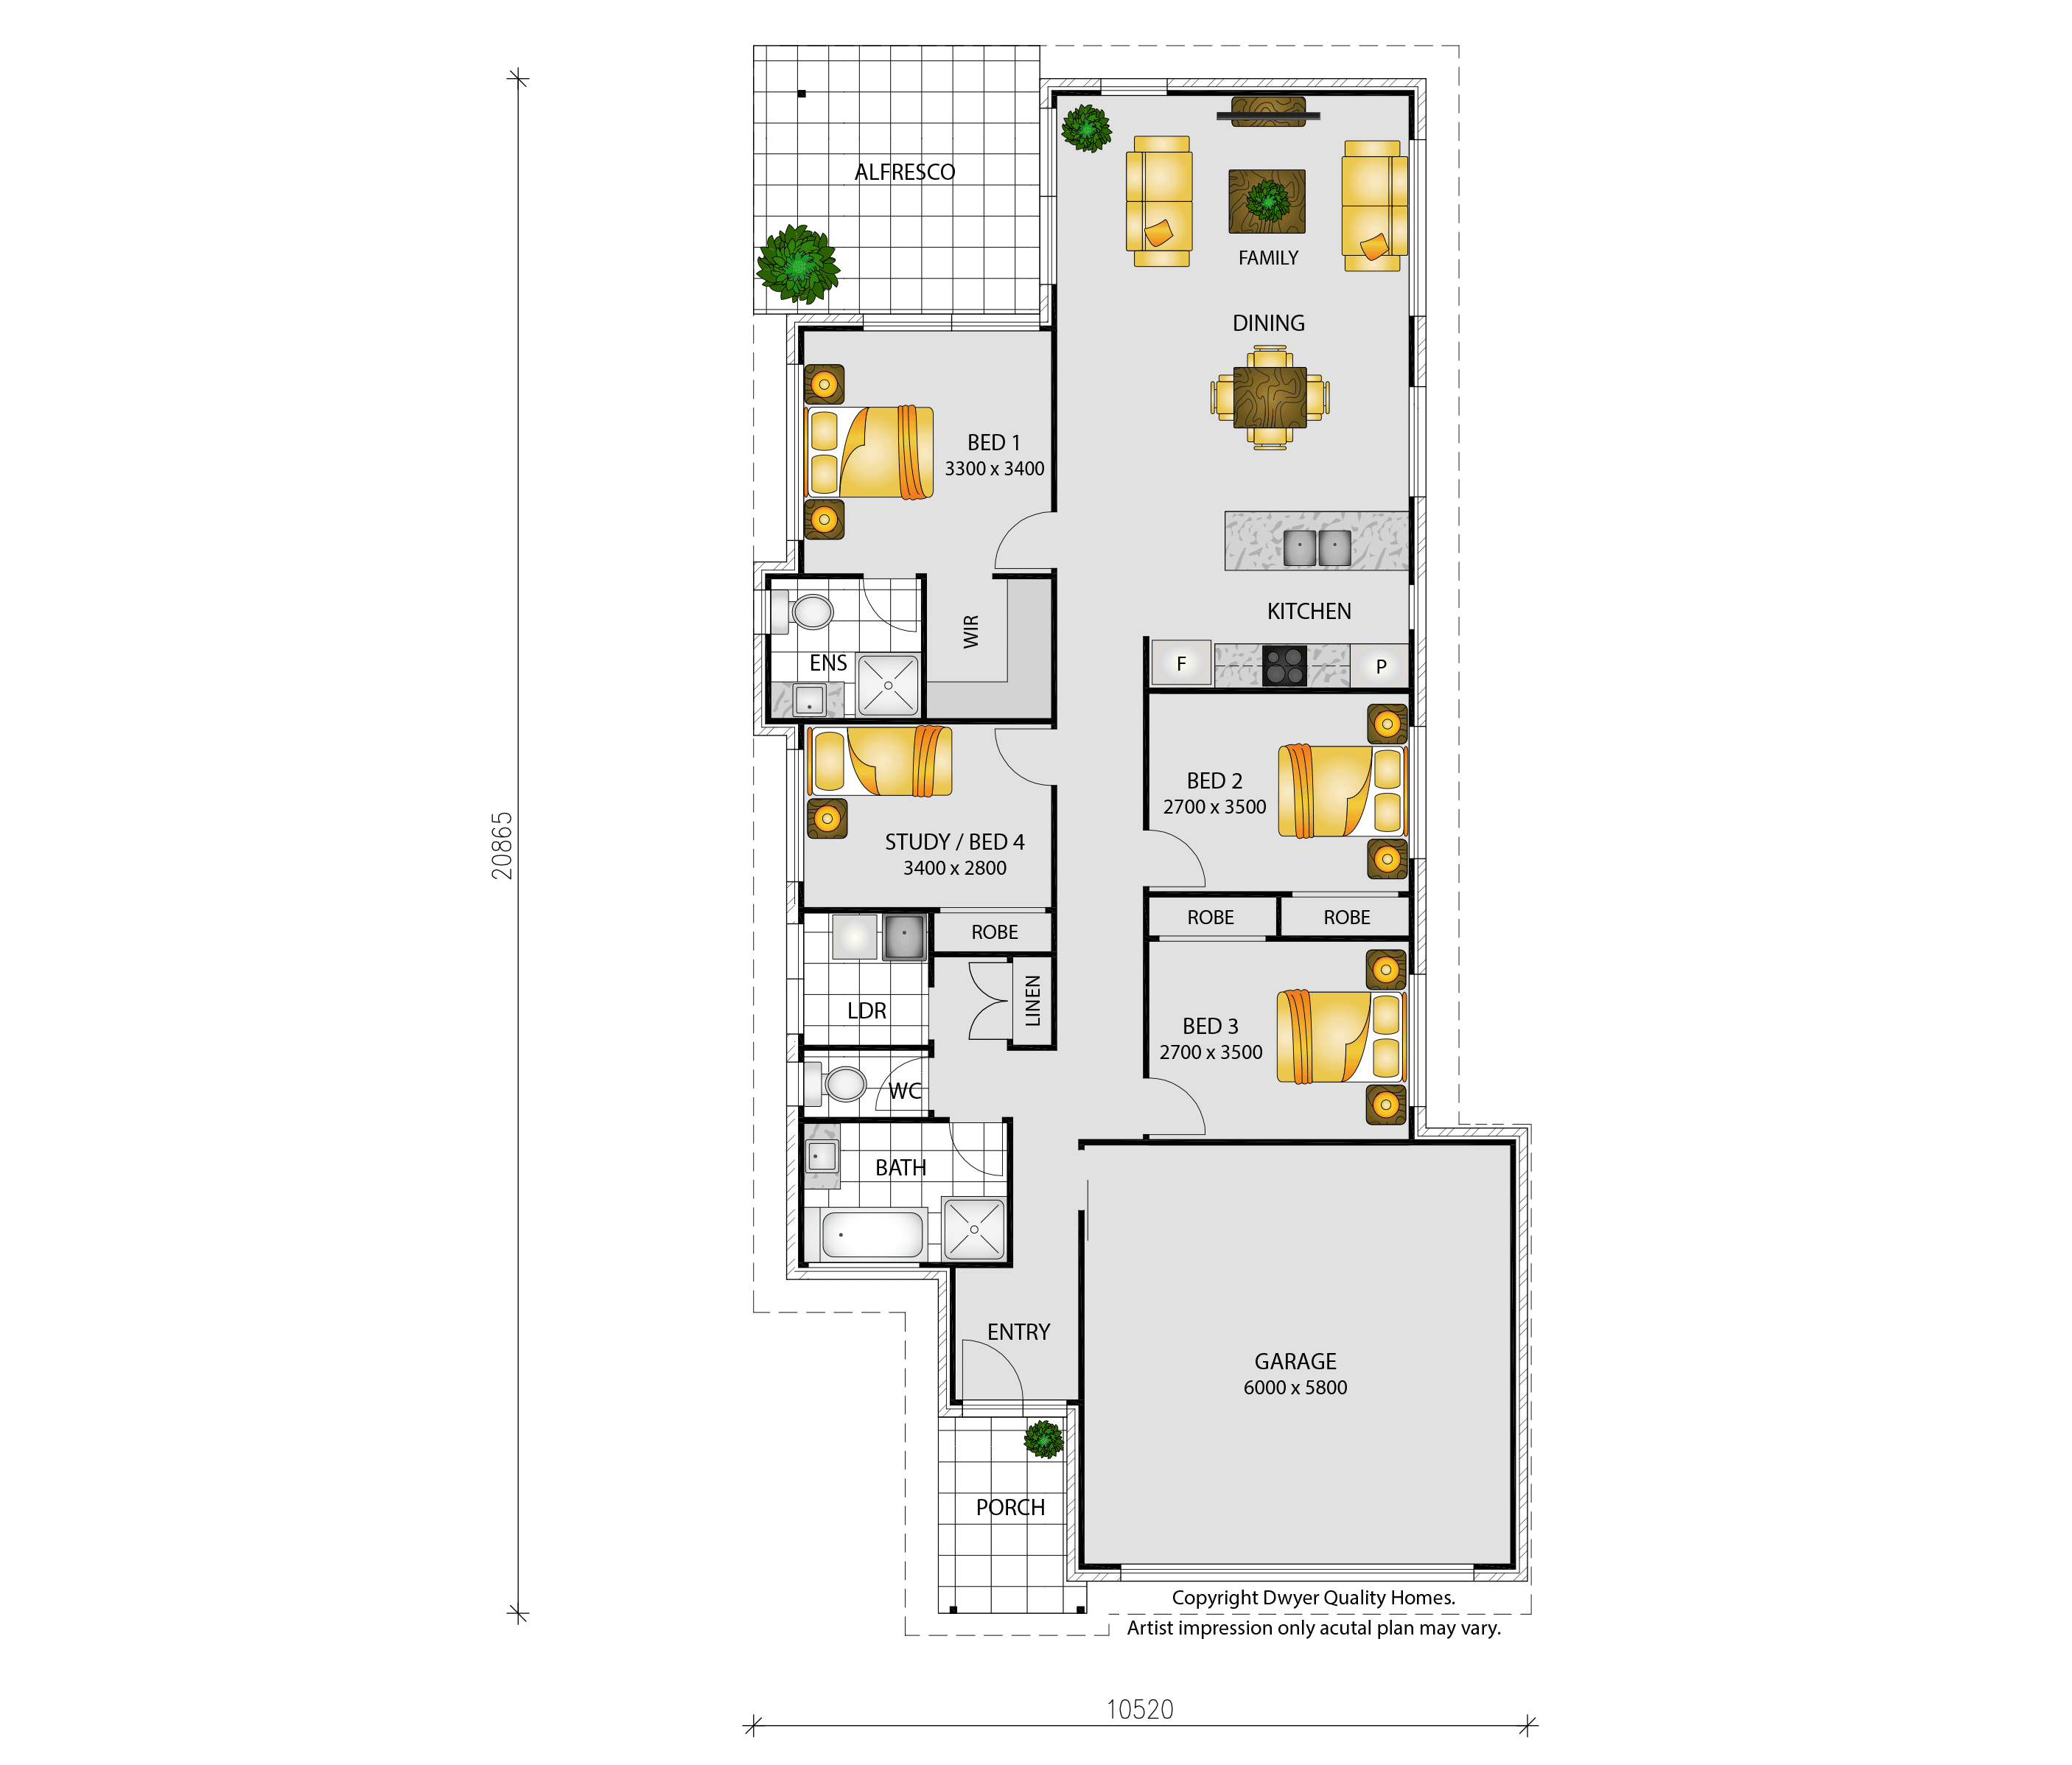 Sienna - Floorplans